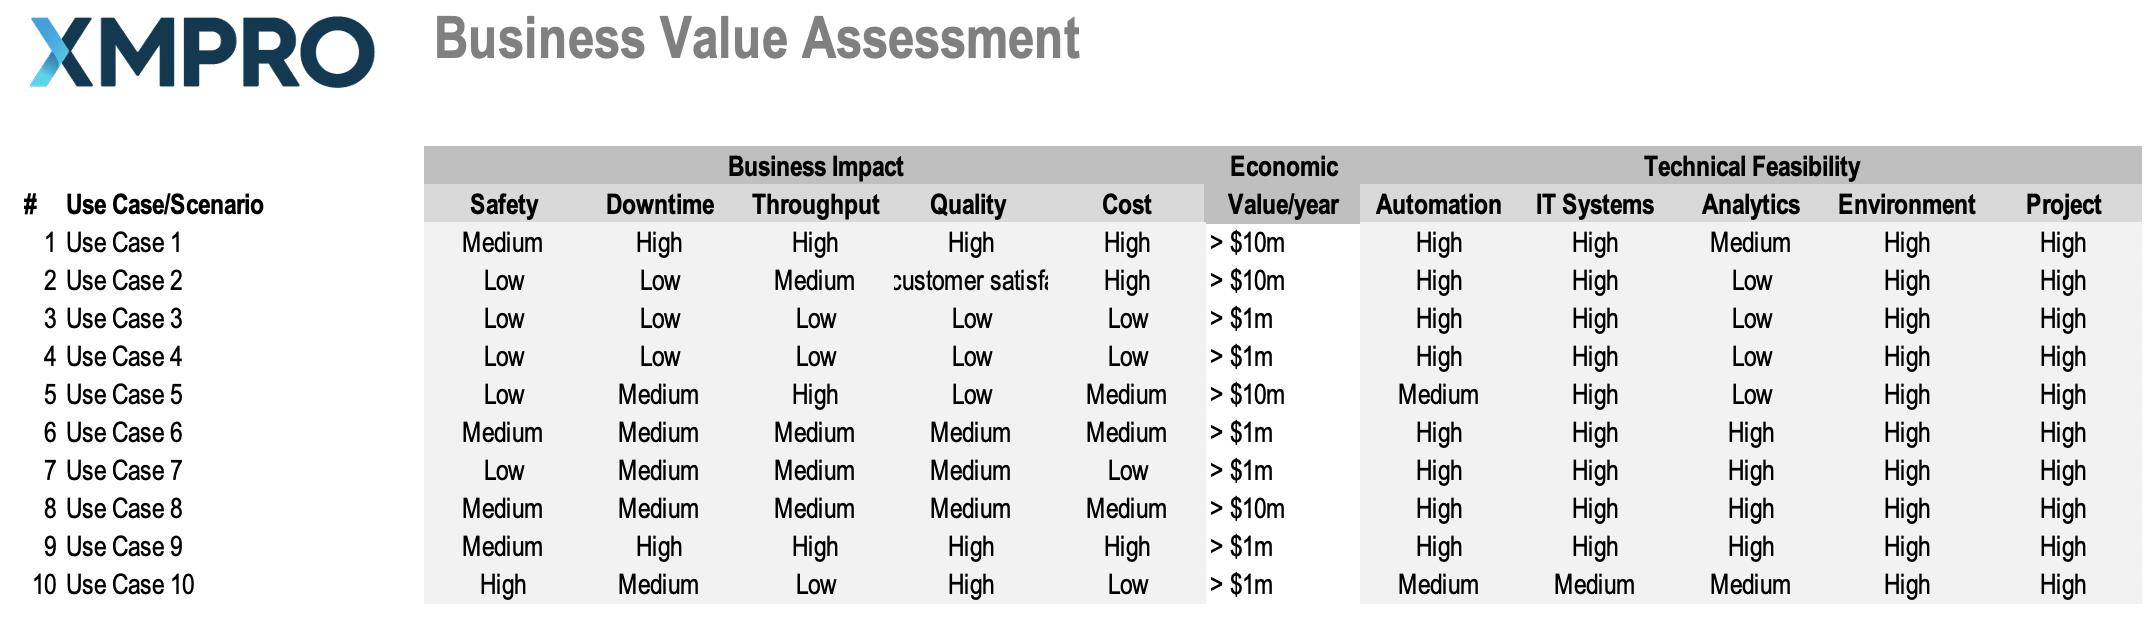 Digital twin business value assessment